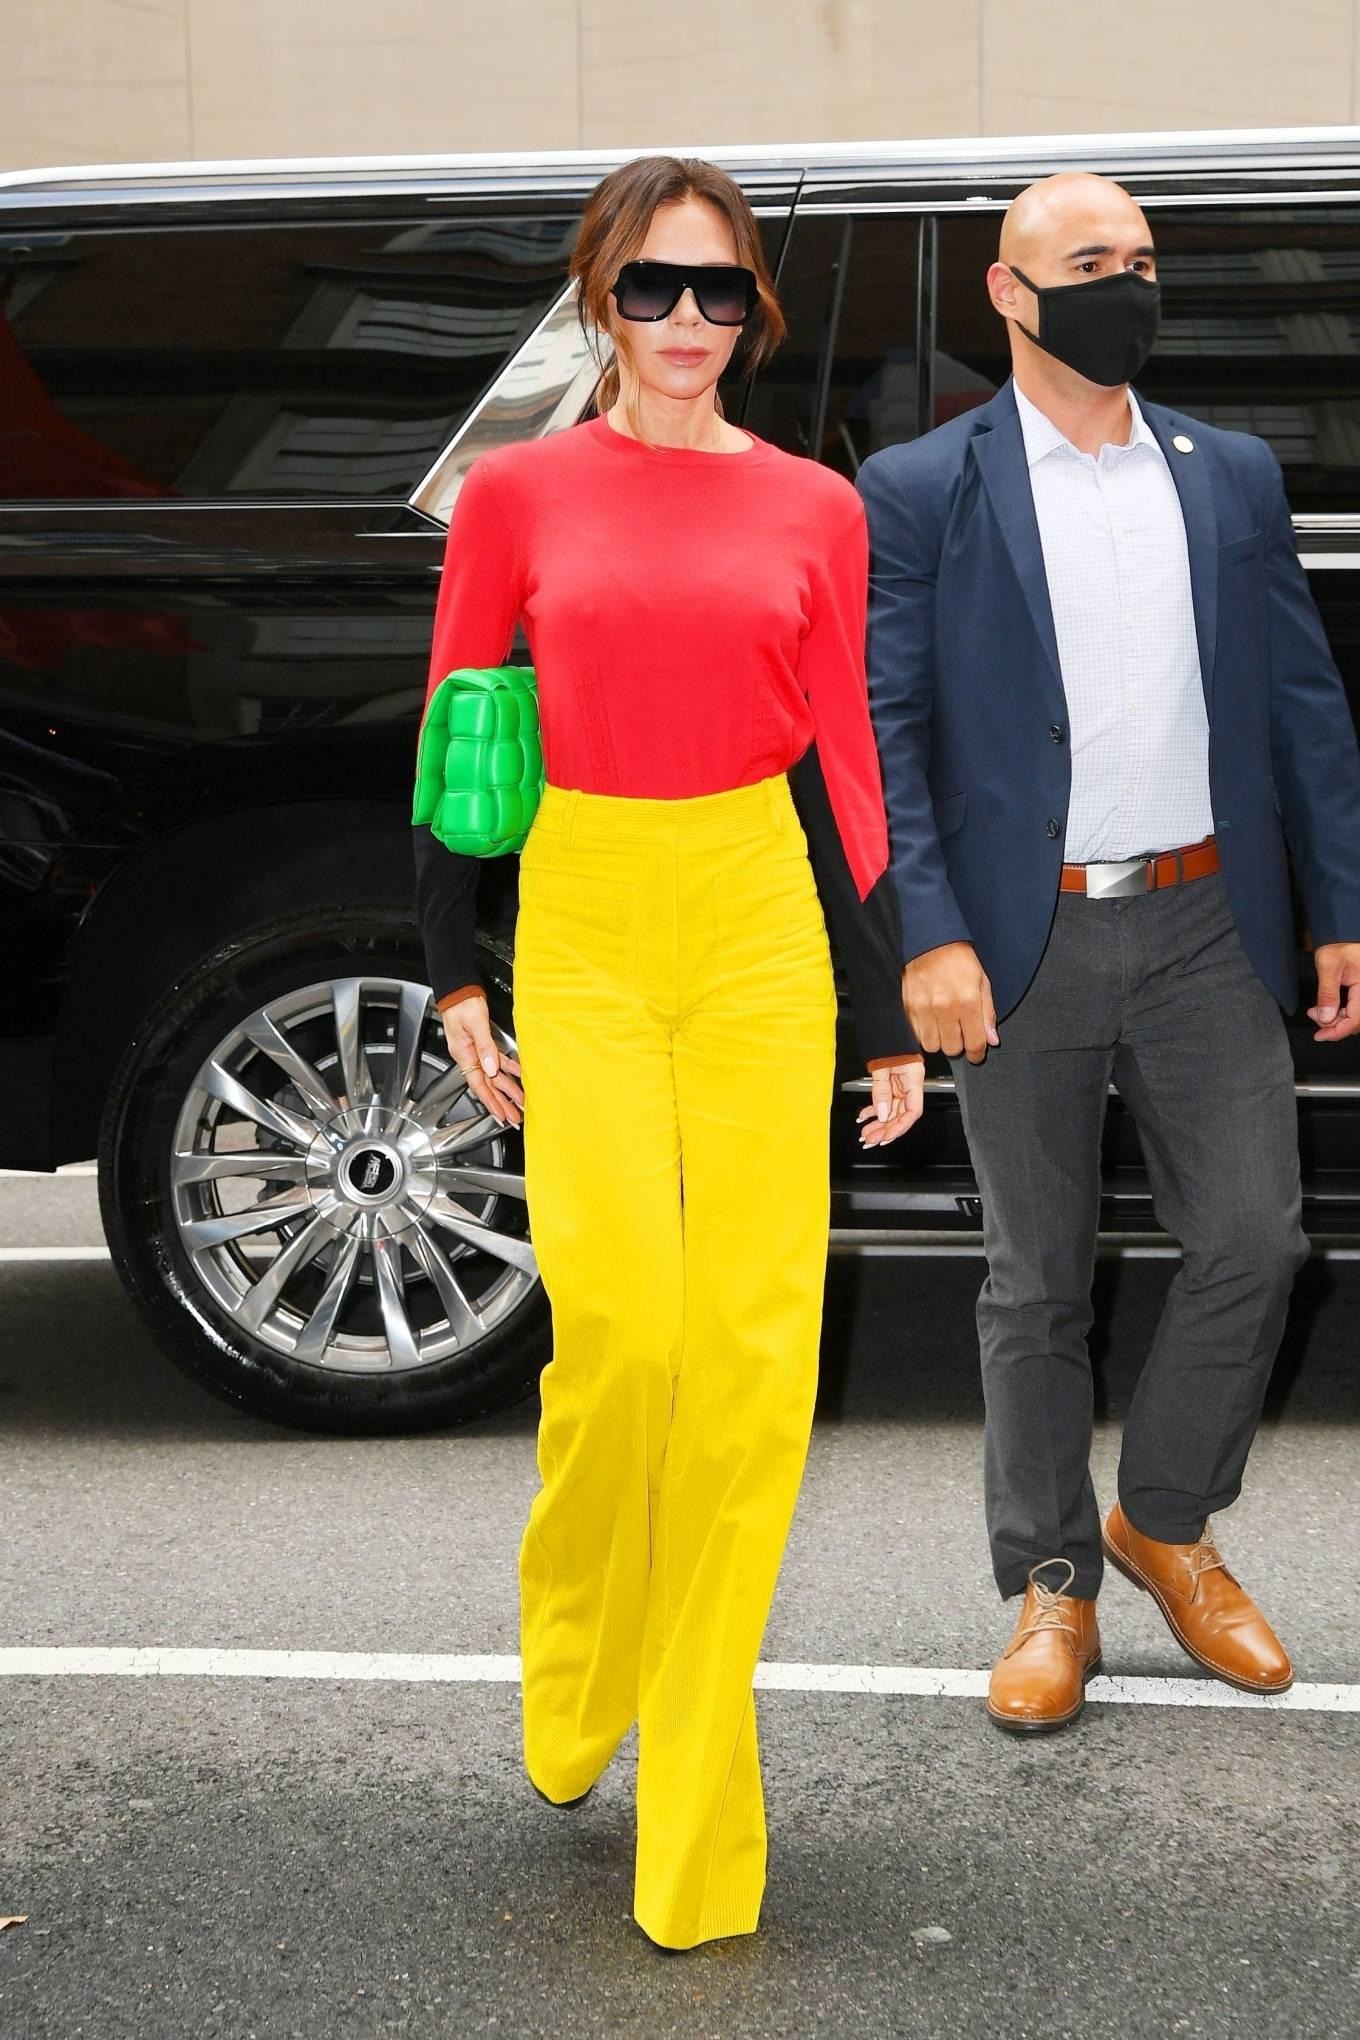 Victoria Beckham 2021 : Victoria Beckham – on Good Morning America promoting her new designer clothing in New York City-32